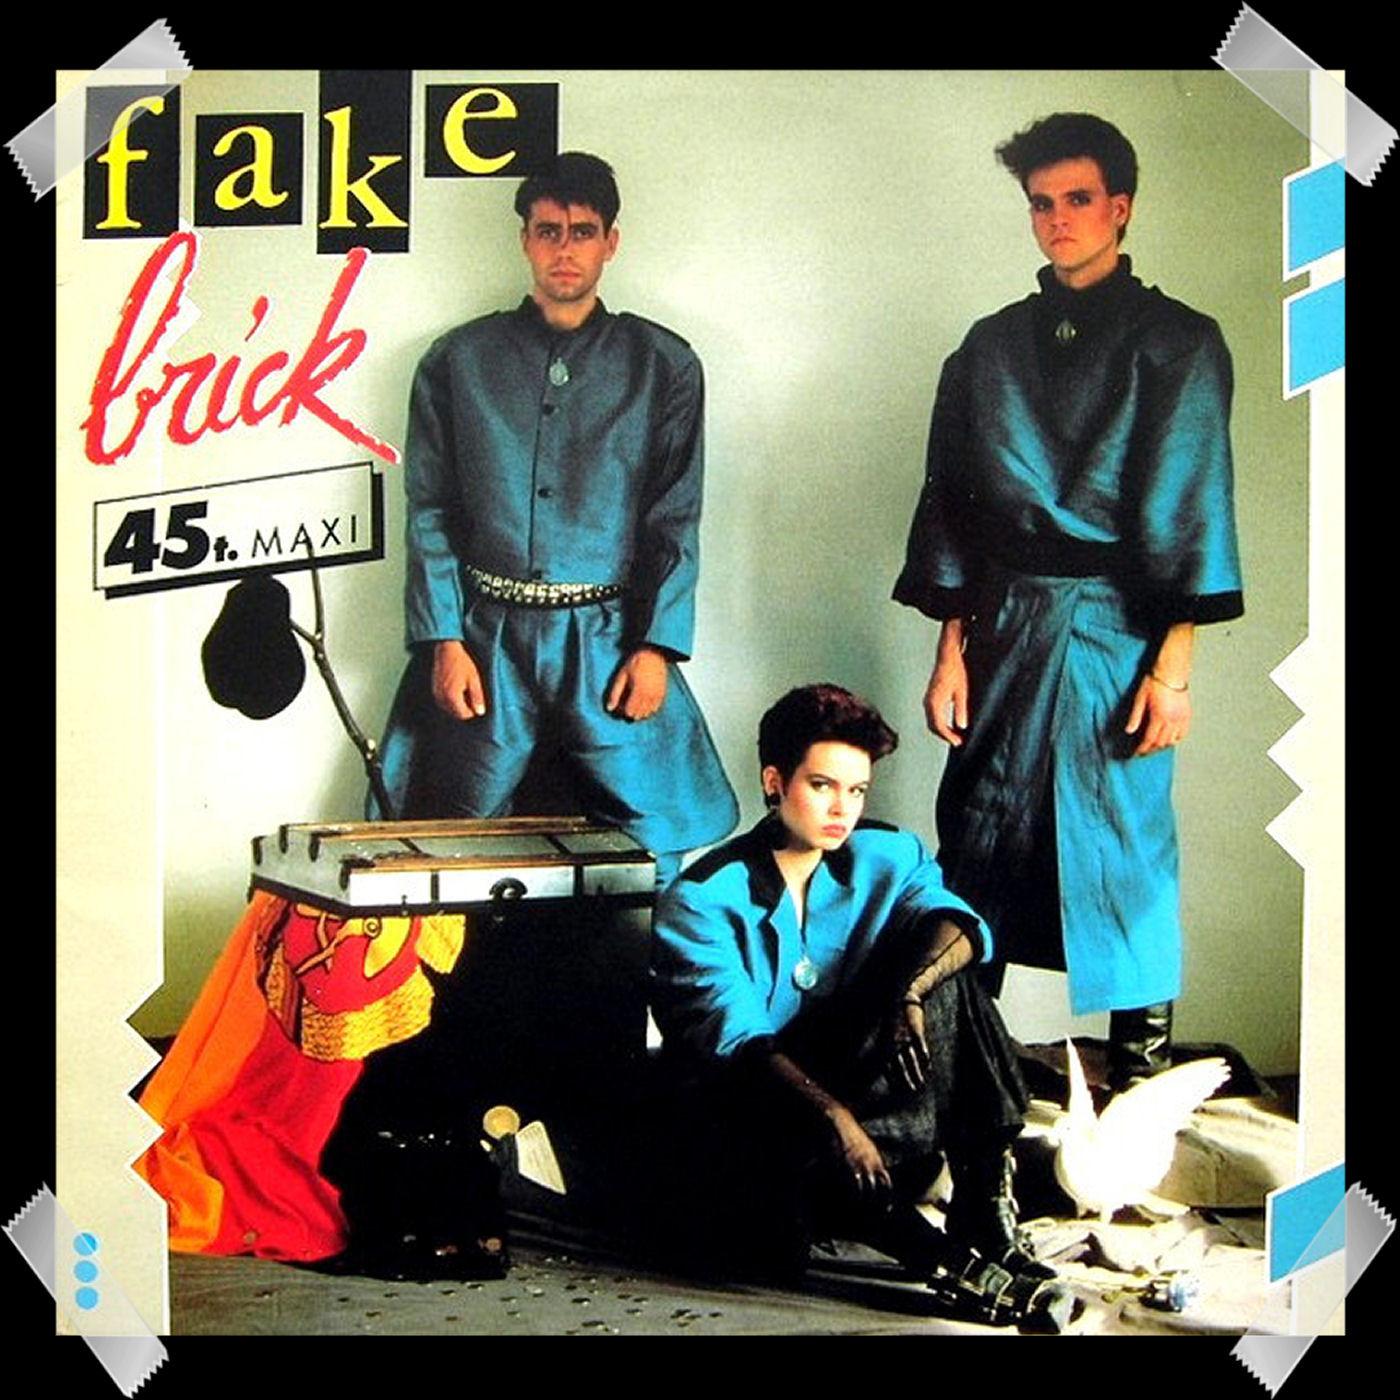 18. Fake - Brick